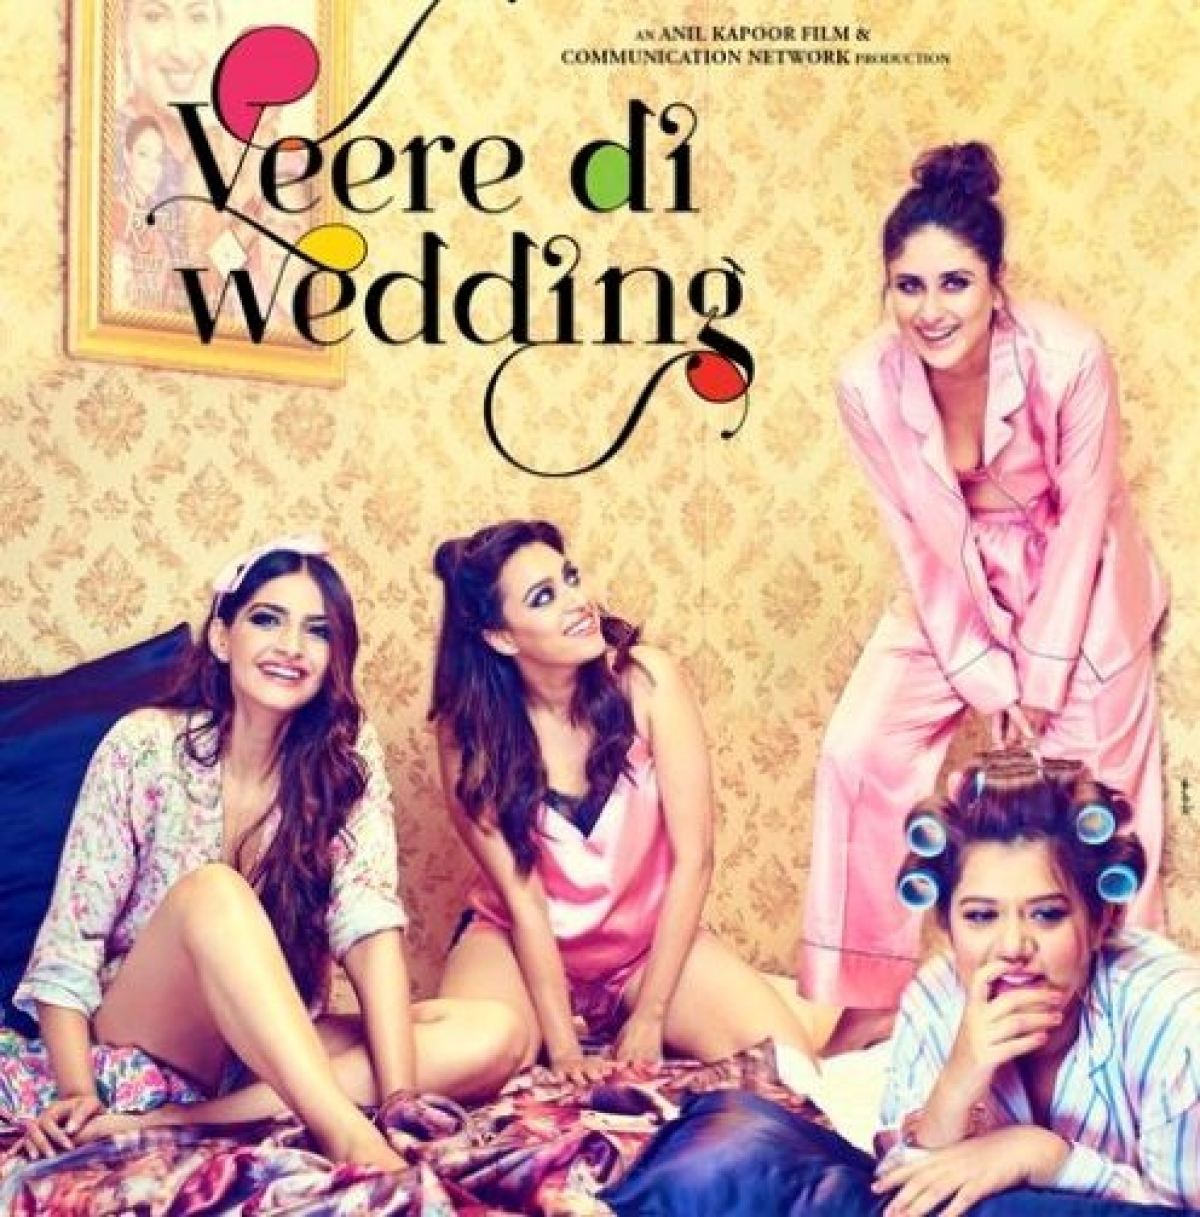 'Veere Di Wedding' New Poster: Kareena, Sonam, Swara and Shikha stun in night suits